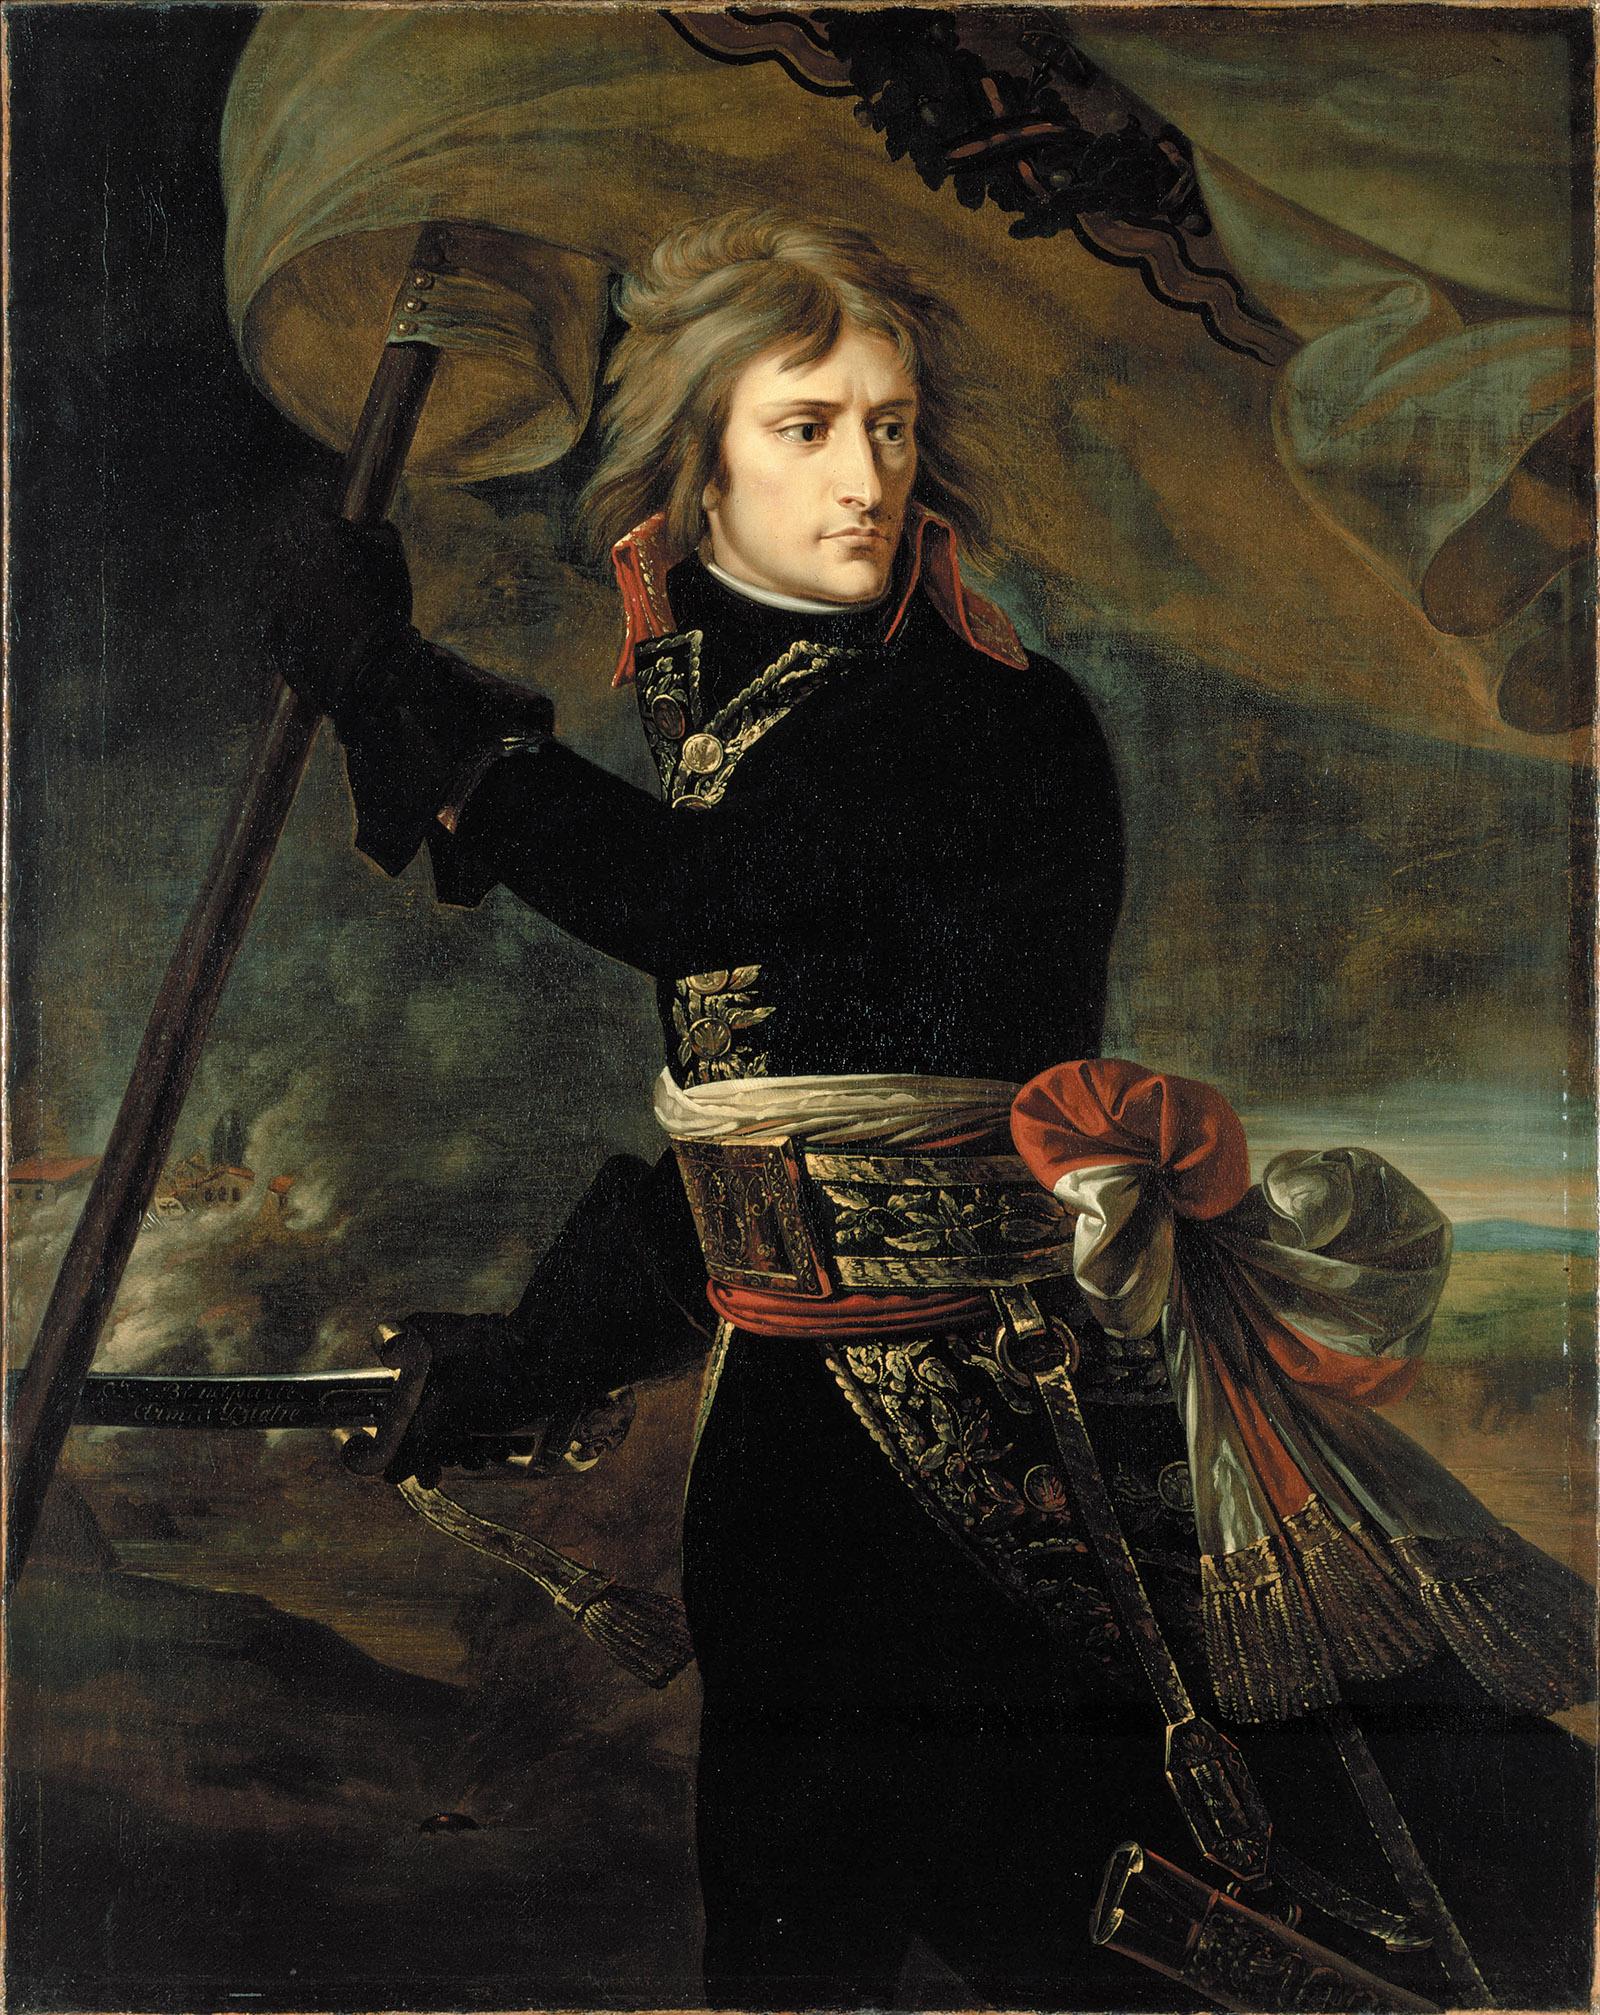 Napoleon Bonaparte at the Bridge of Arcole, 1796 by Antoine-Jean Gros